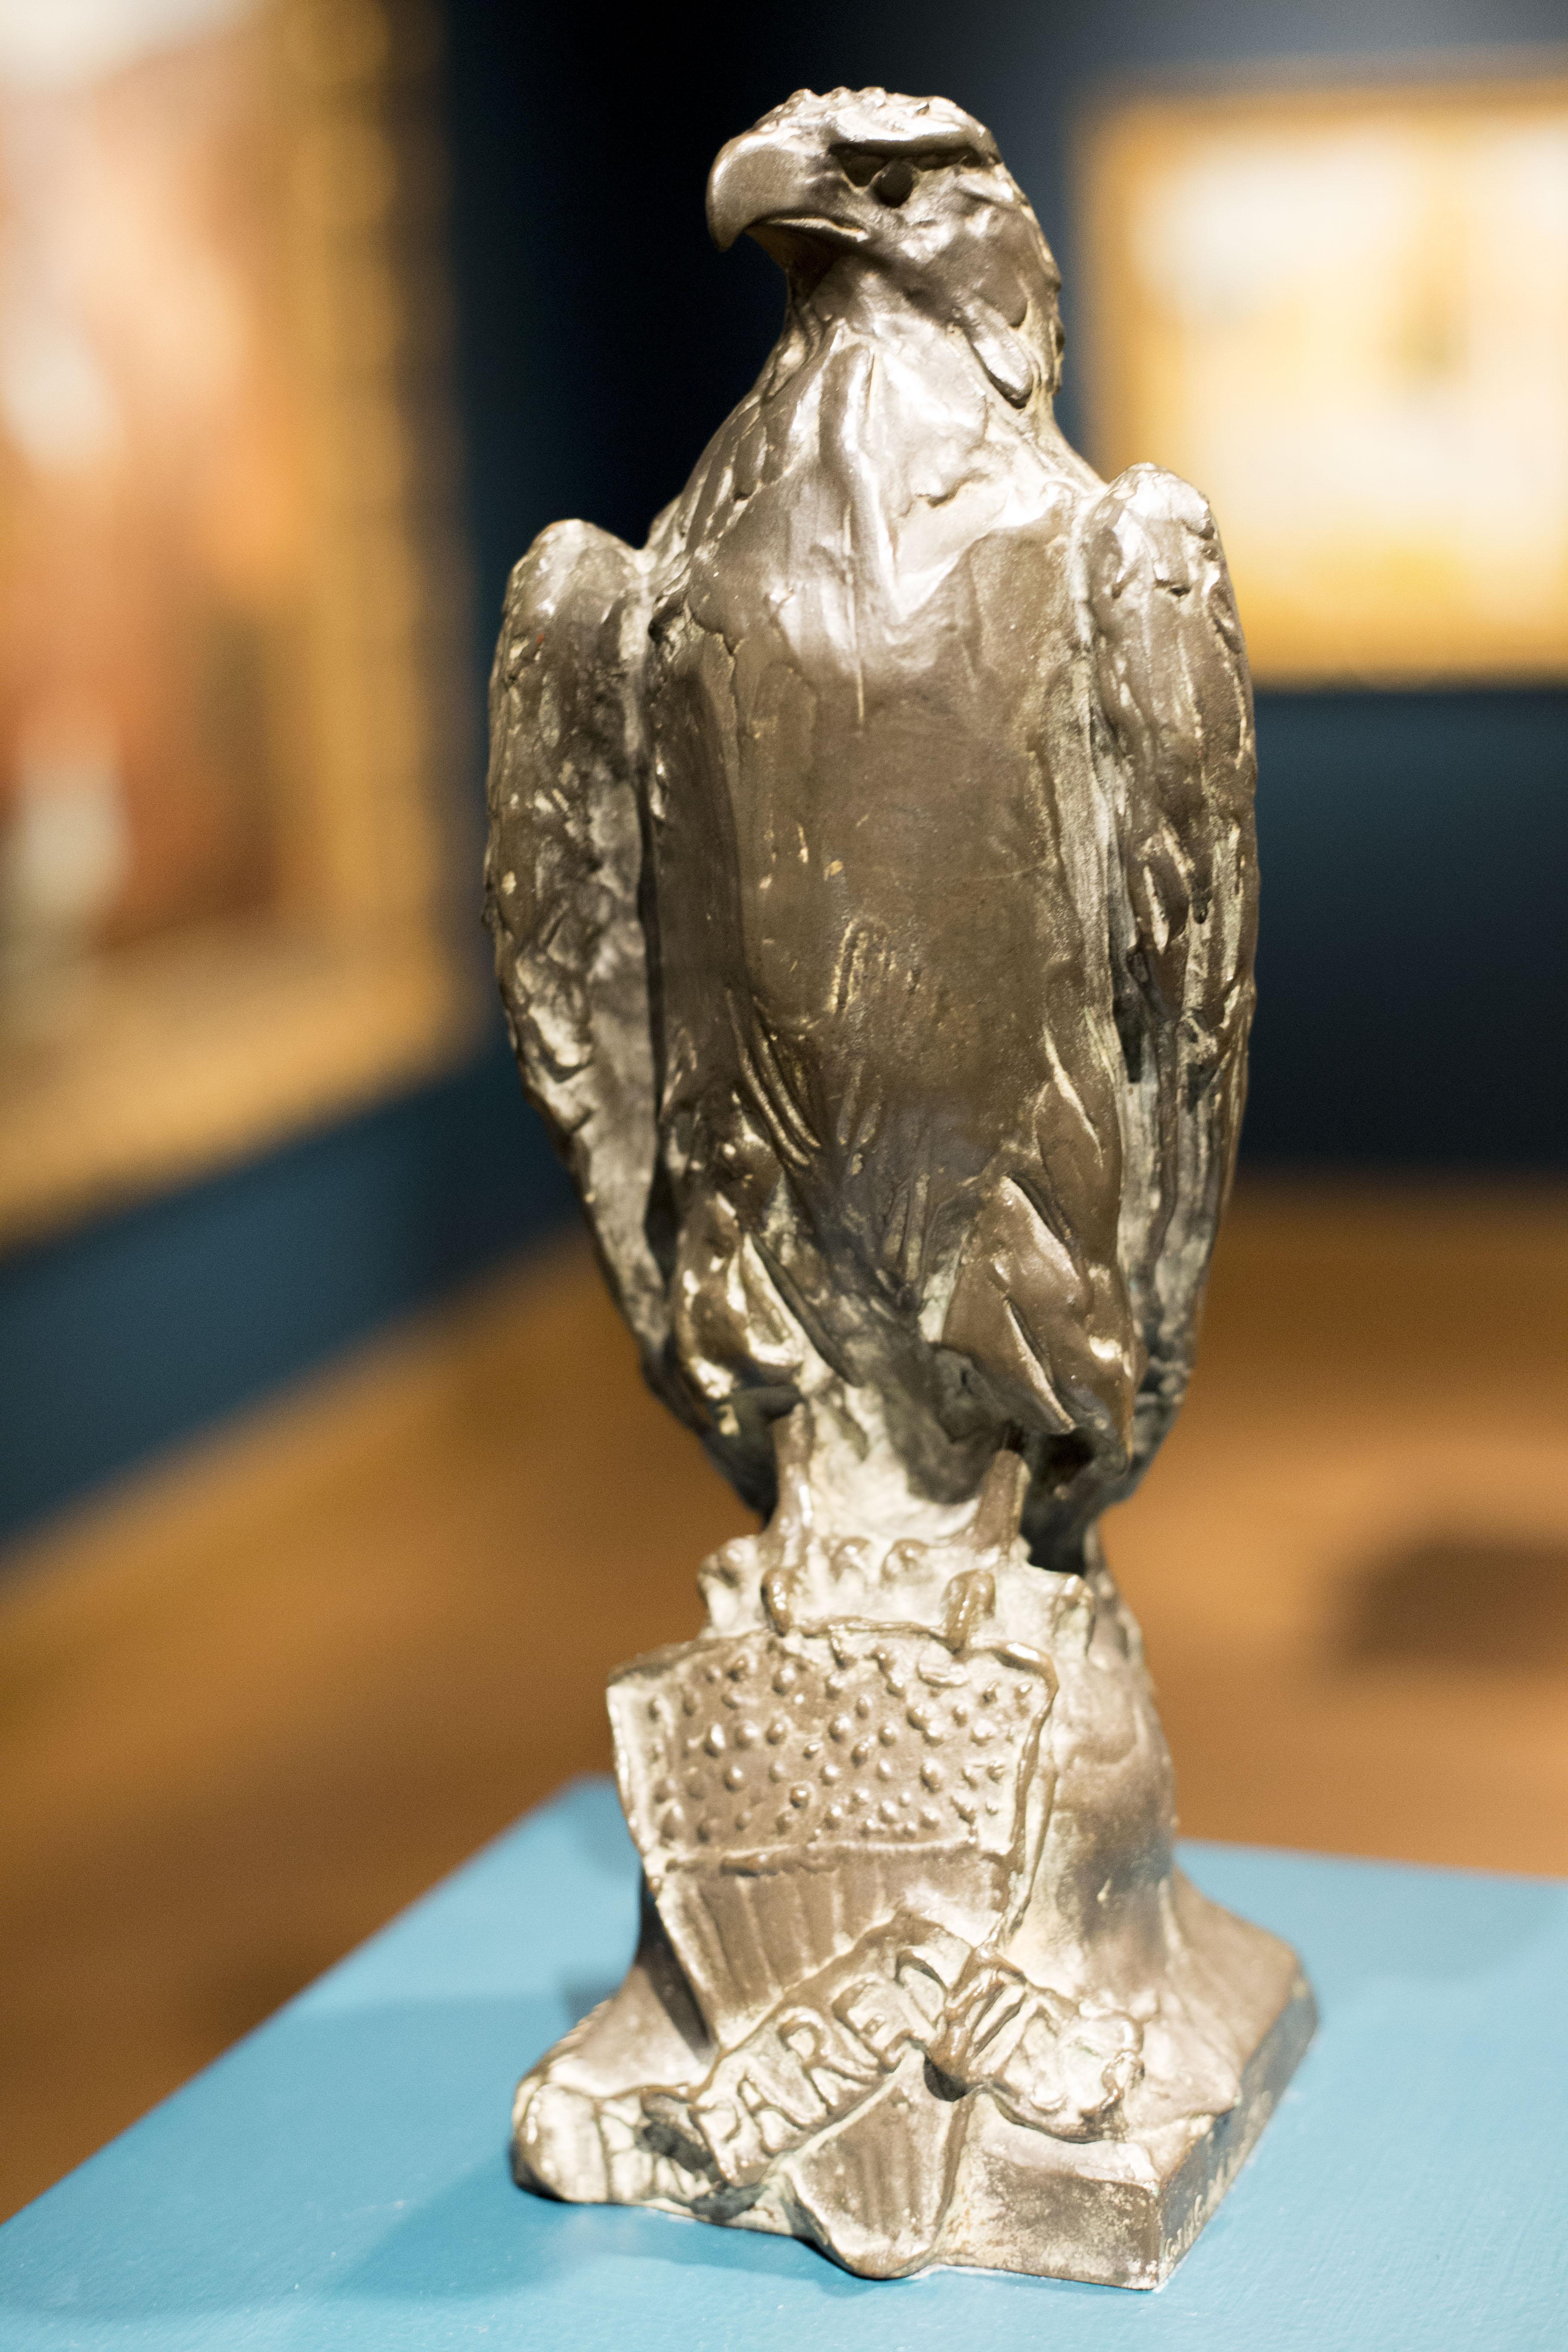 Paul Wayland Bartlett (American, 1865-1925), Eagle of Preparedness, 1916. Bronze. 13 x 4 1/2 x 3 3/4 in. Collection of Birmingham Museum of Art; Gift of Mrs. Armistead Peter III 1958.37